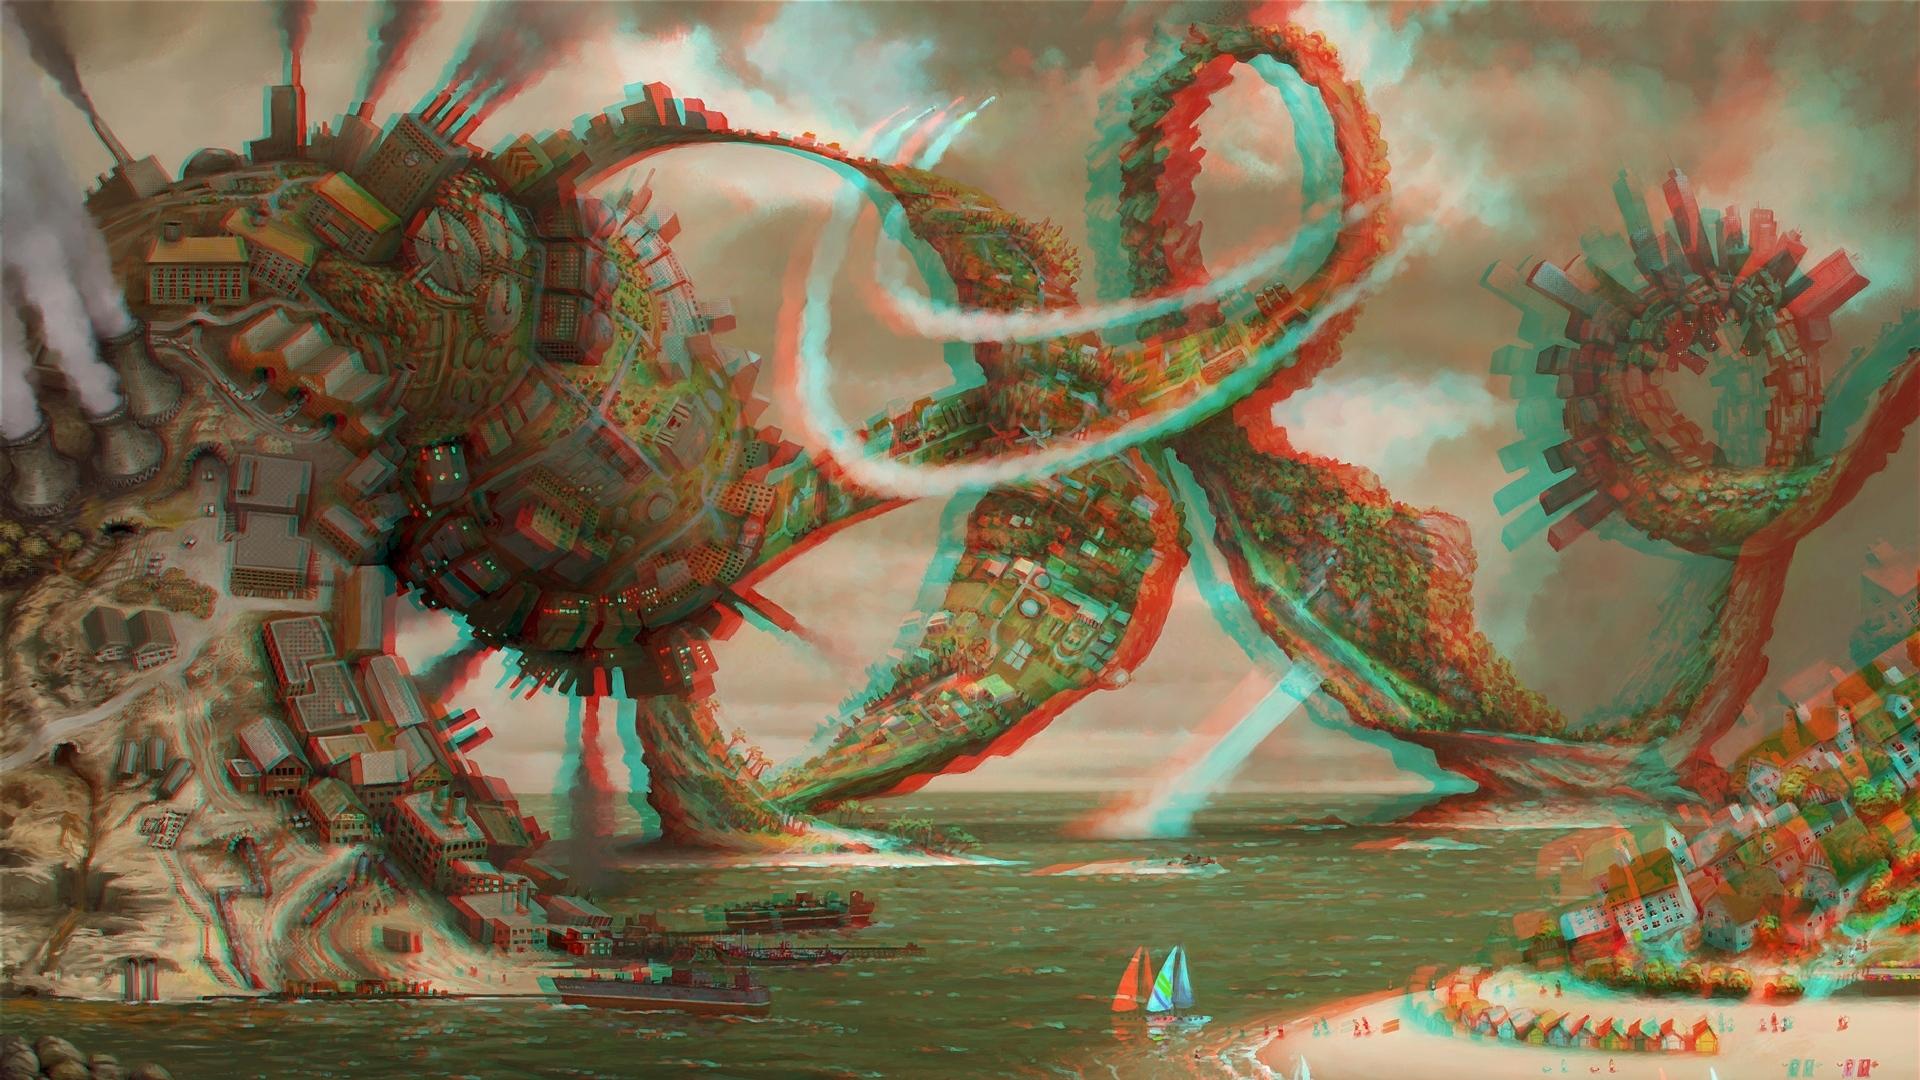 download wallpaper 1920x1080 3d, graphics, explosion, cataclysm